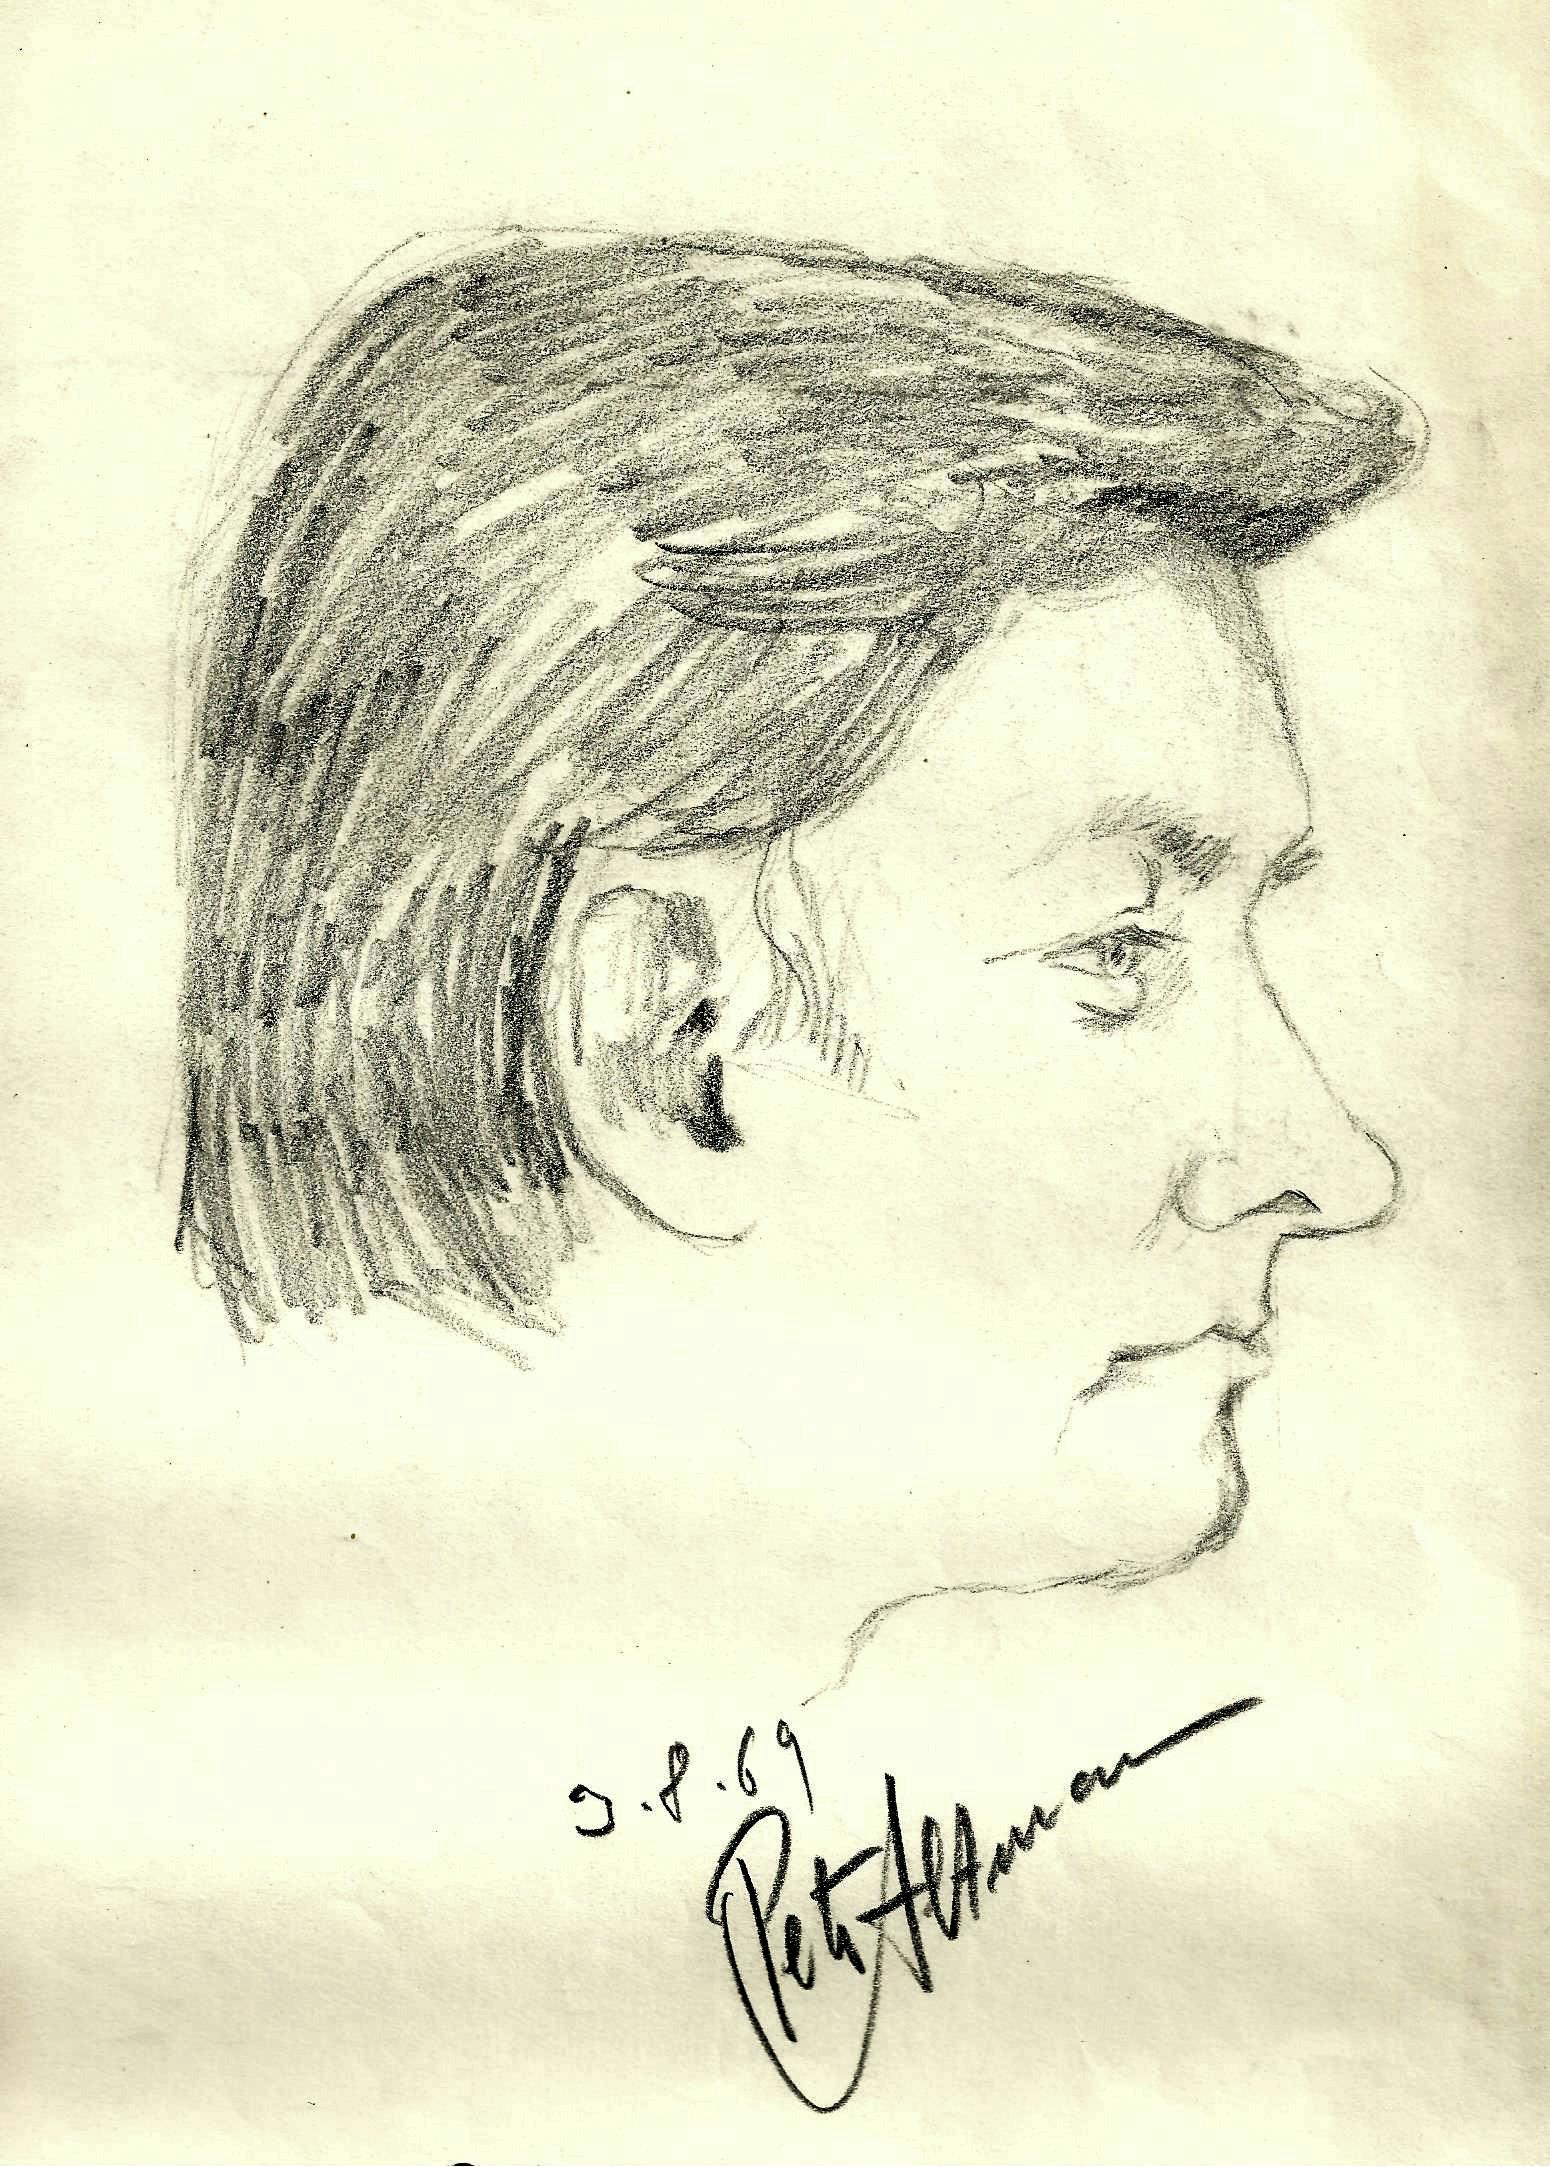 Petr Altman